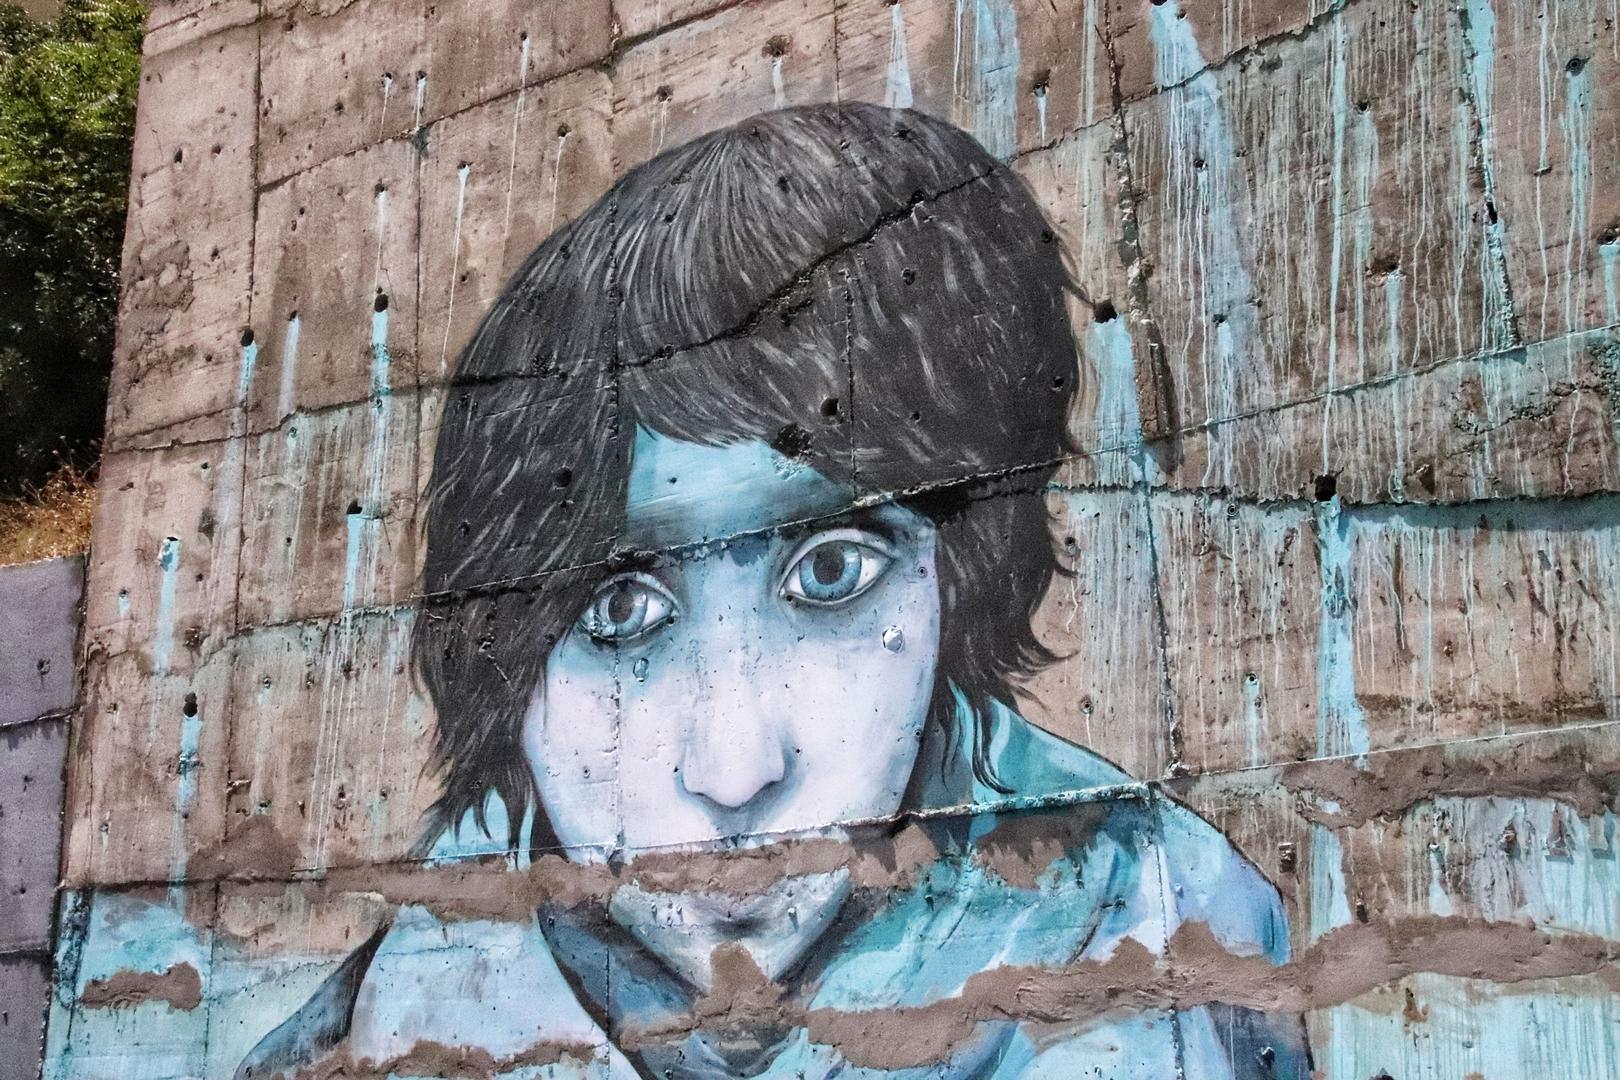 Jordanie - Street art dans les rues d'Amman